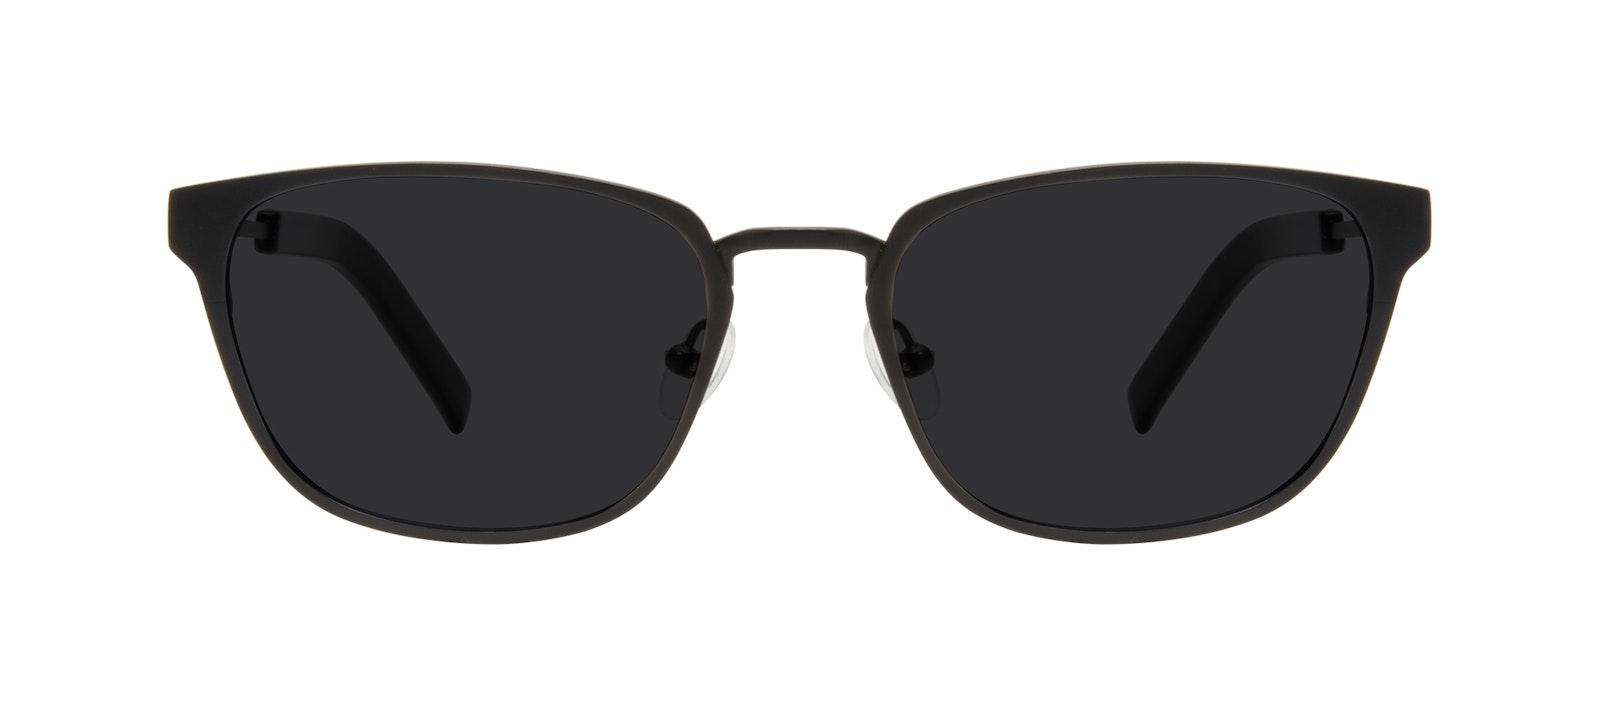 Affordable Fashion Glasses Square Sunglasses Men Flex Onyx Matte Front